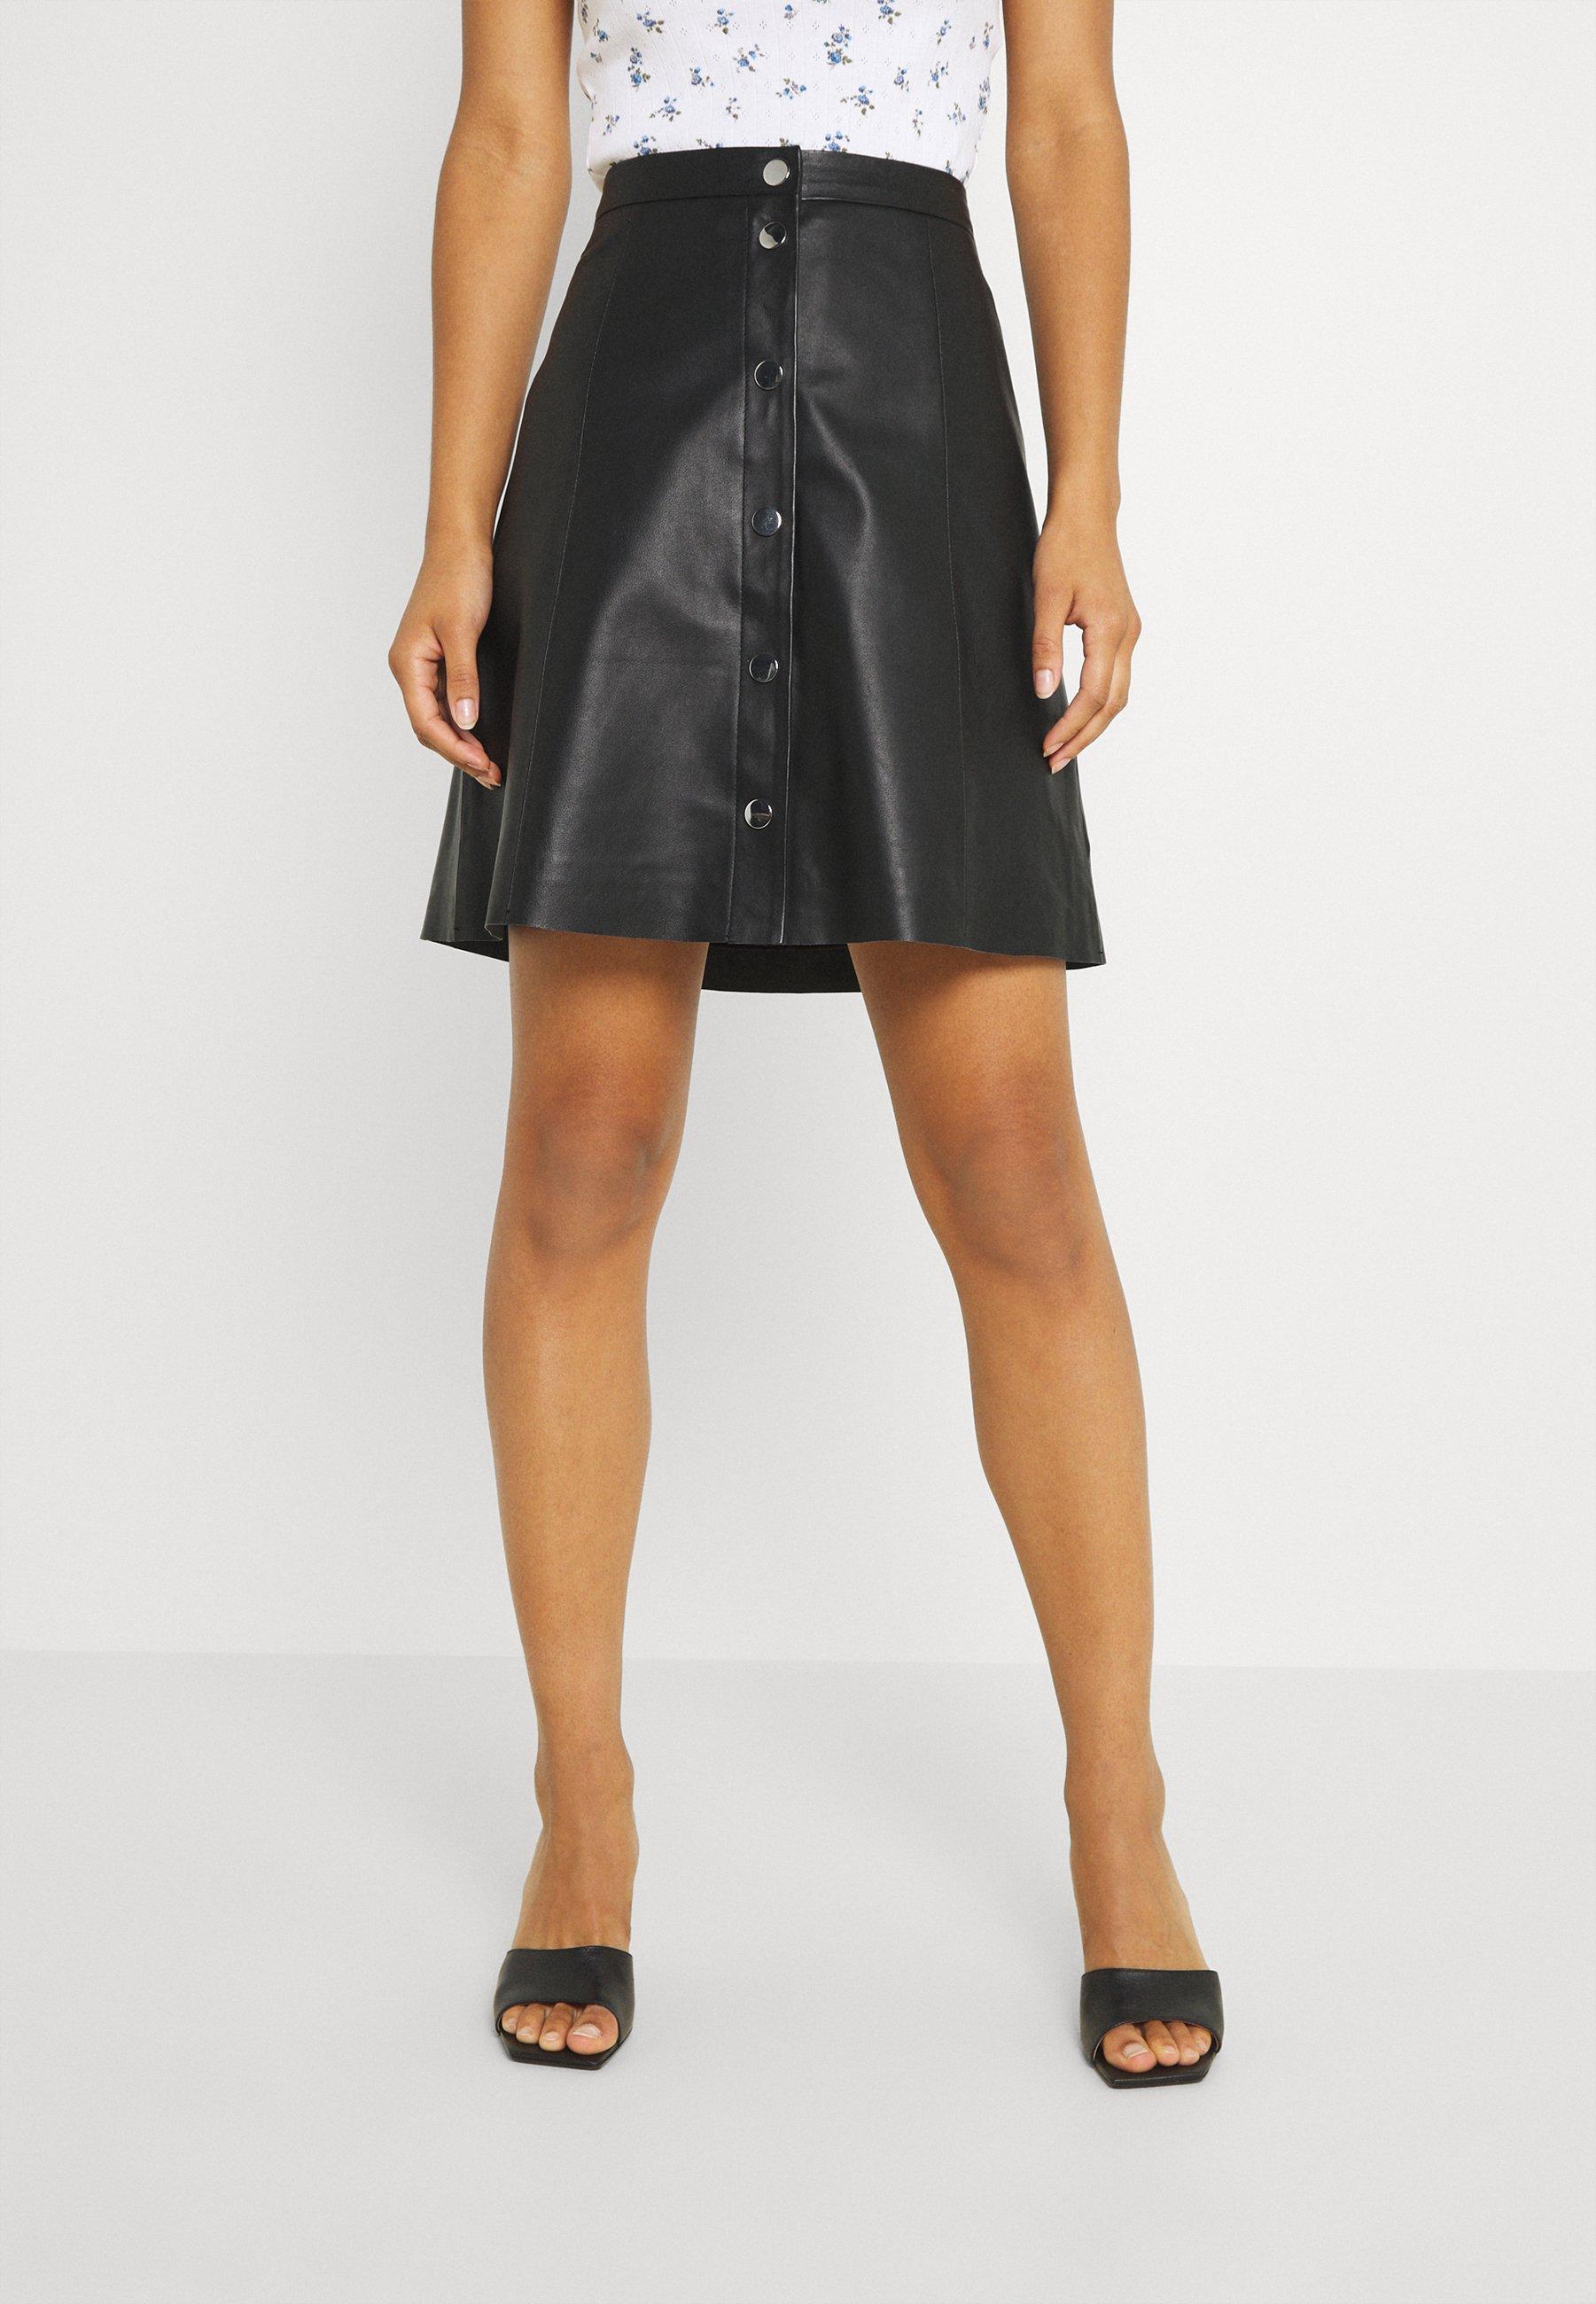 Femme YASBINNA SKIRT - Jupe en cuir